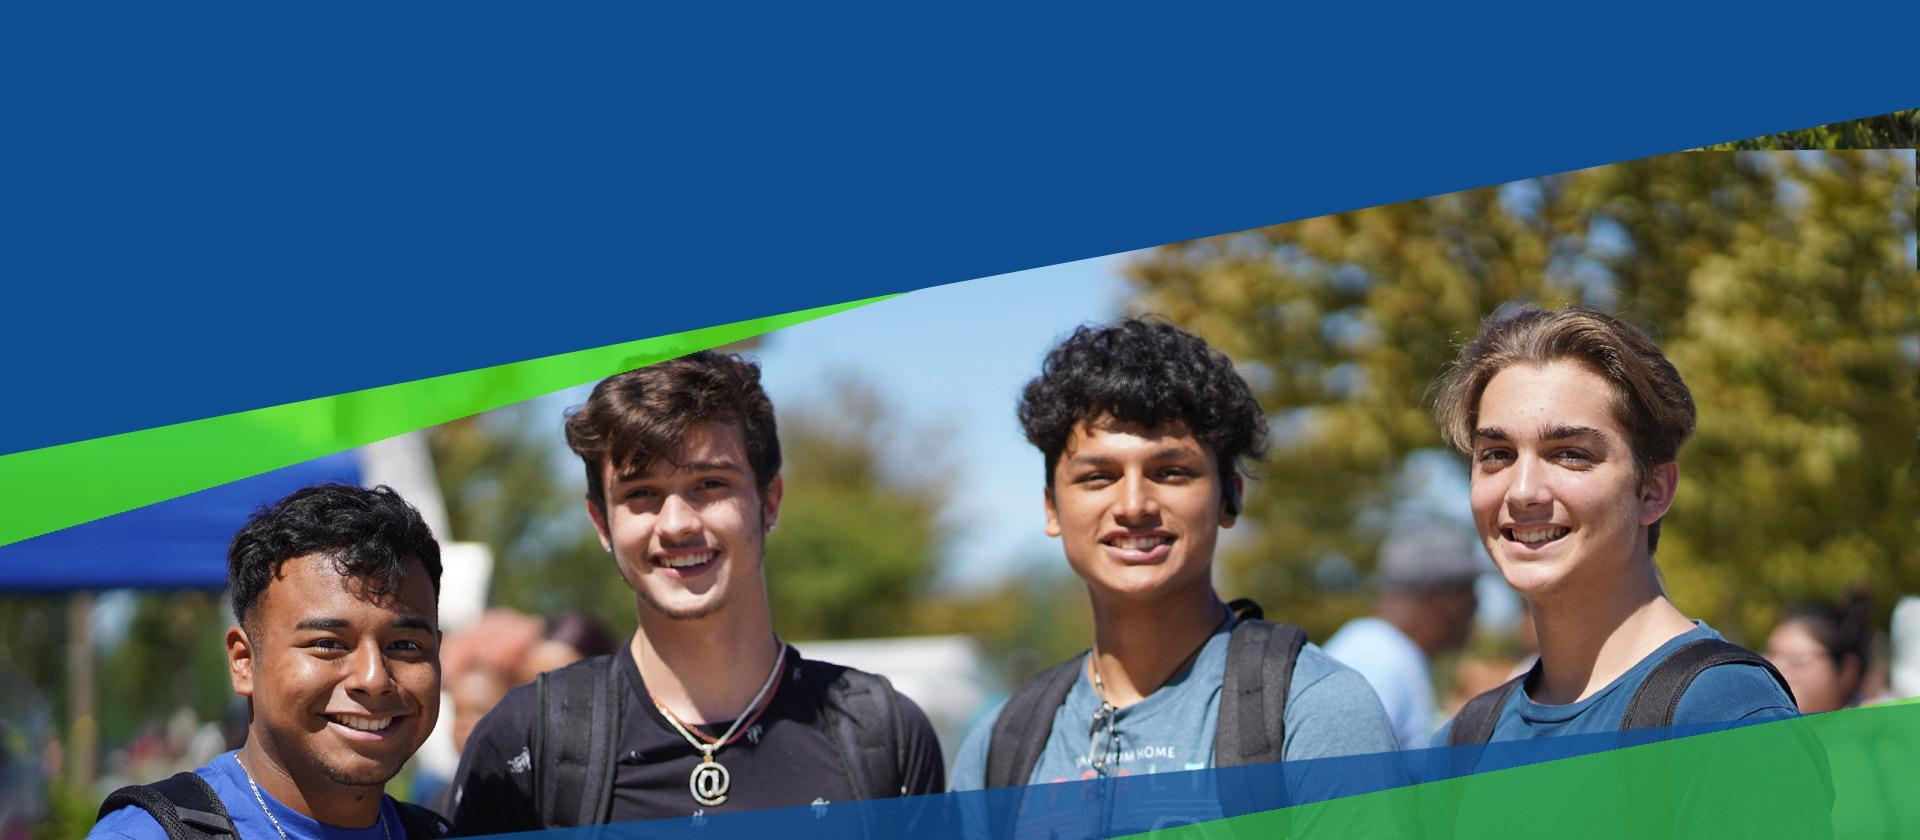 HGTC Students